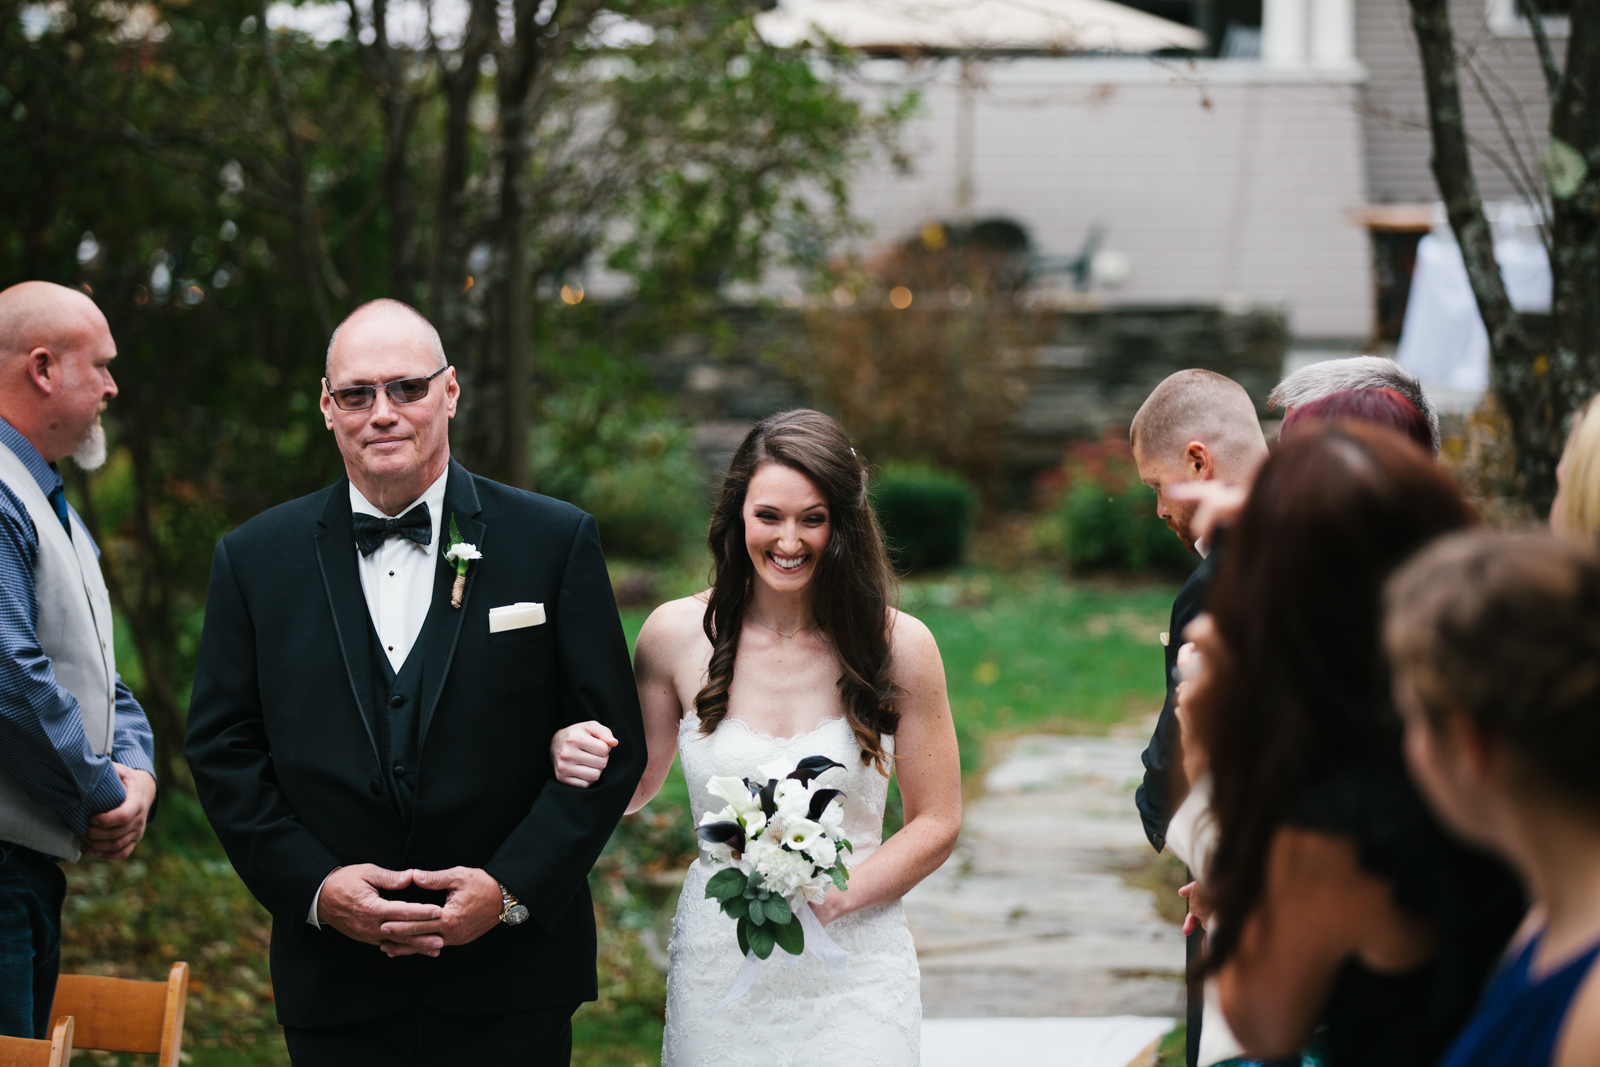 Glimmerstone-Mansion-Vermont-Wedding-Photography-Amanda-Morgan-54.jpg